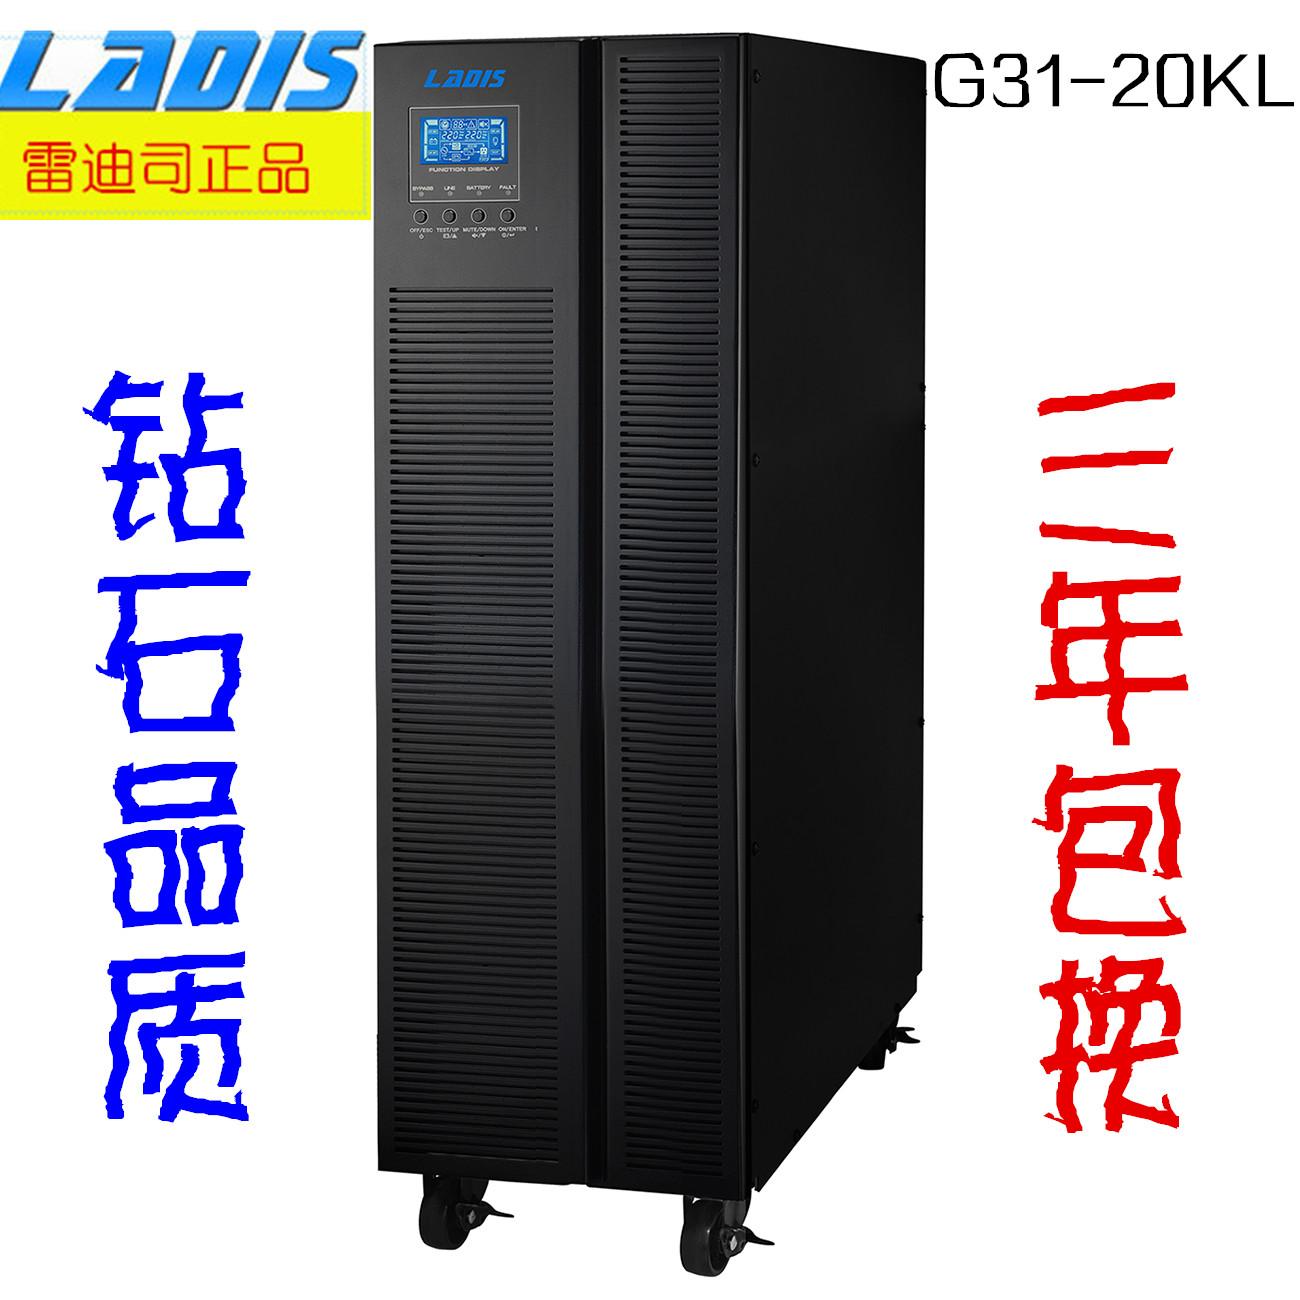 Reddy UPS UPS G31L-20KL für online - 20KVA16KW Linie 380V220V optional